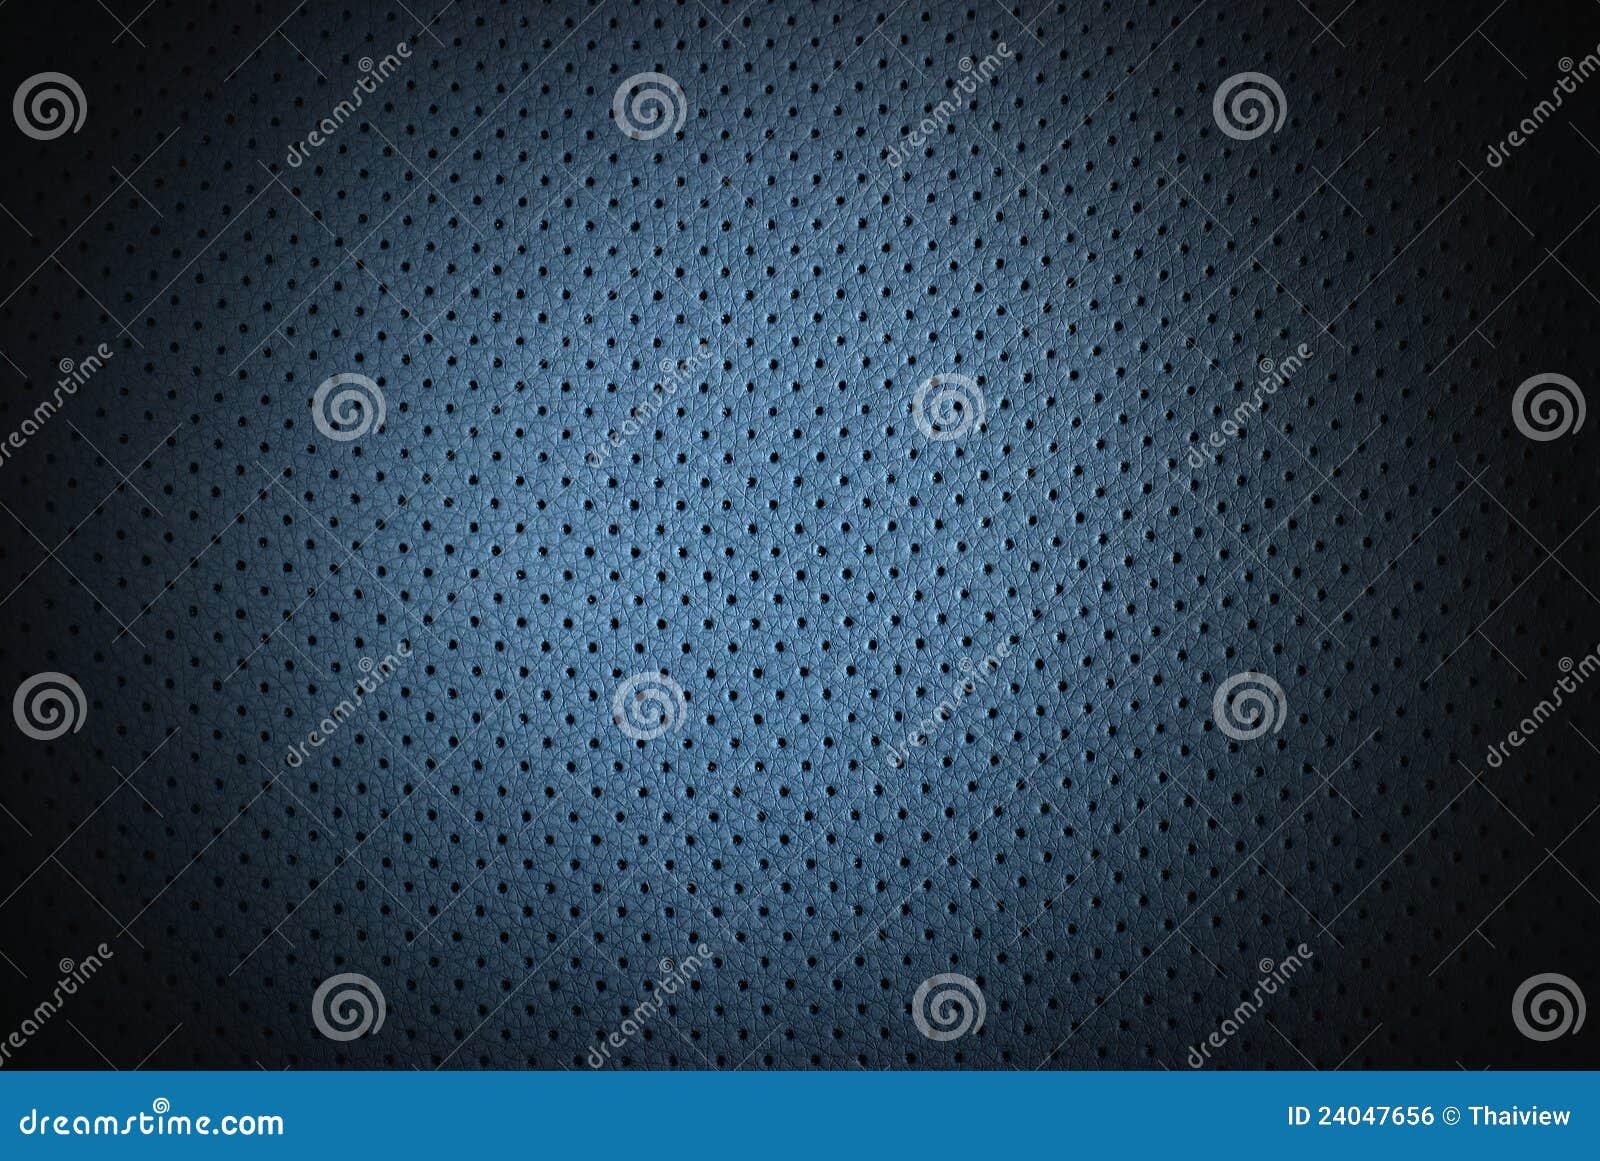 light blue leather background - photo #38